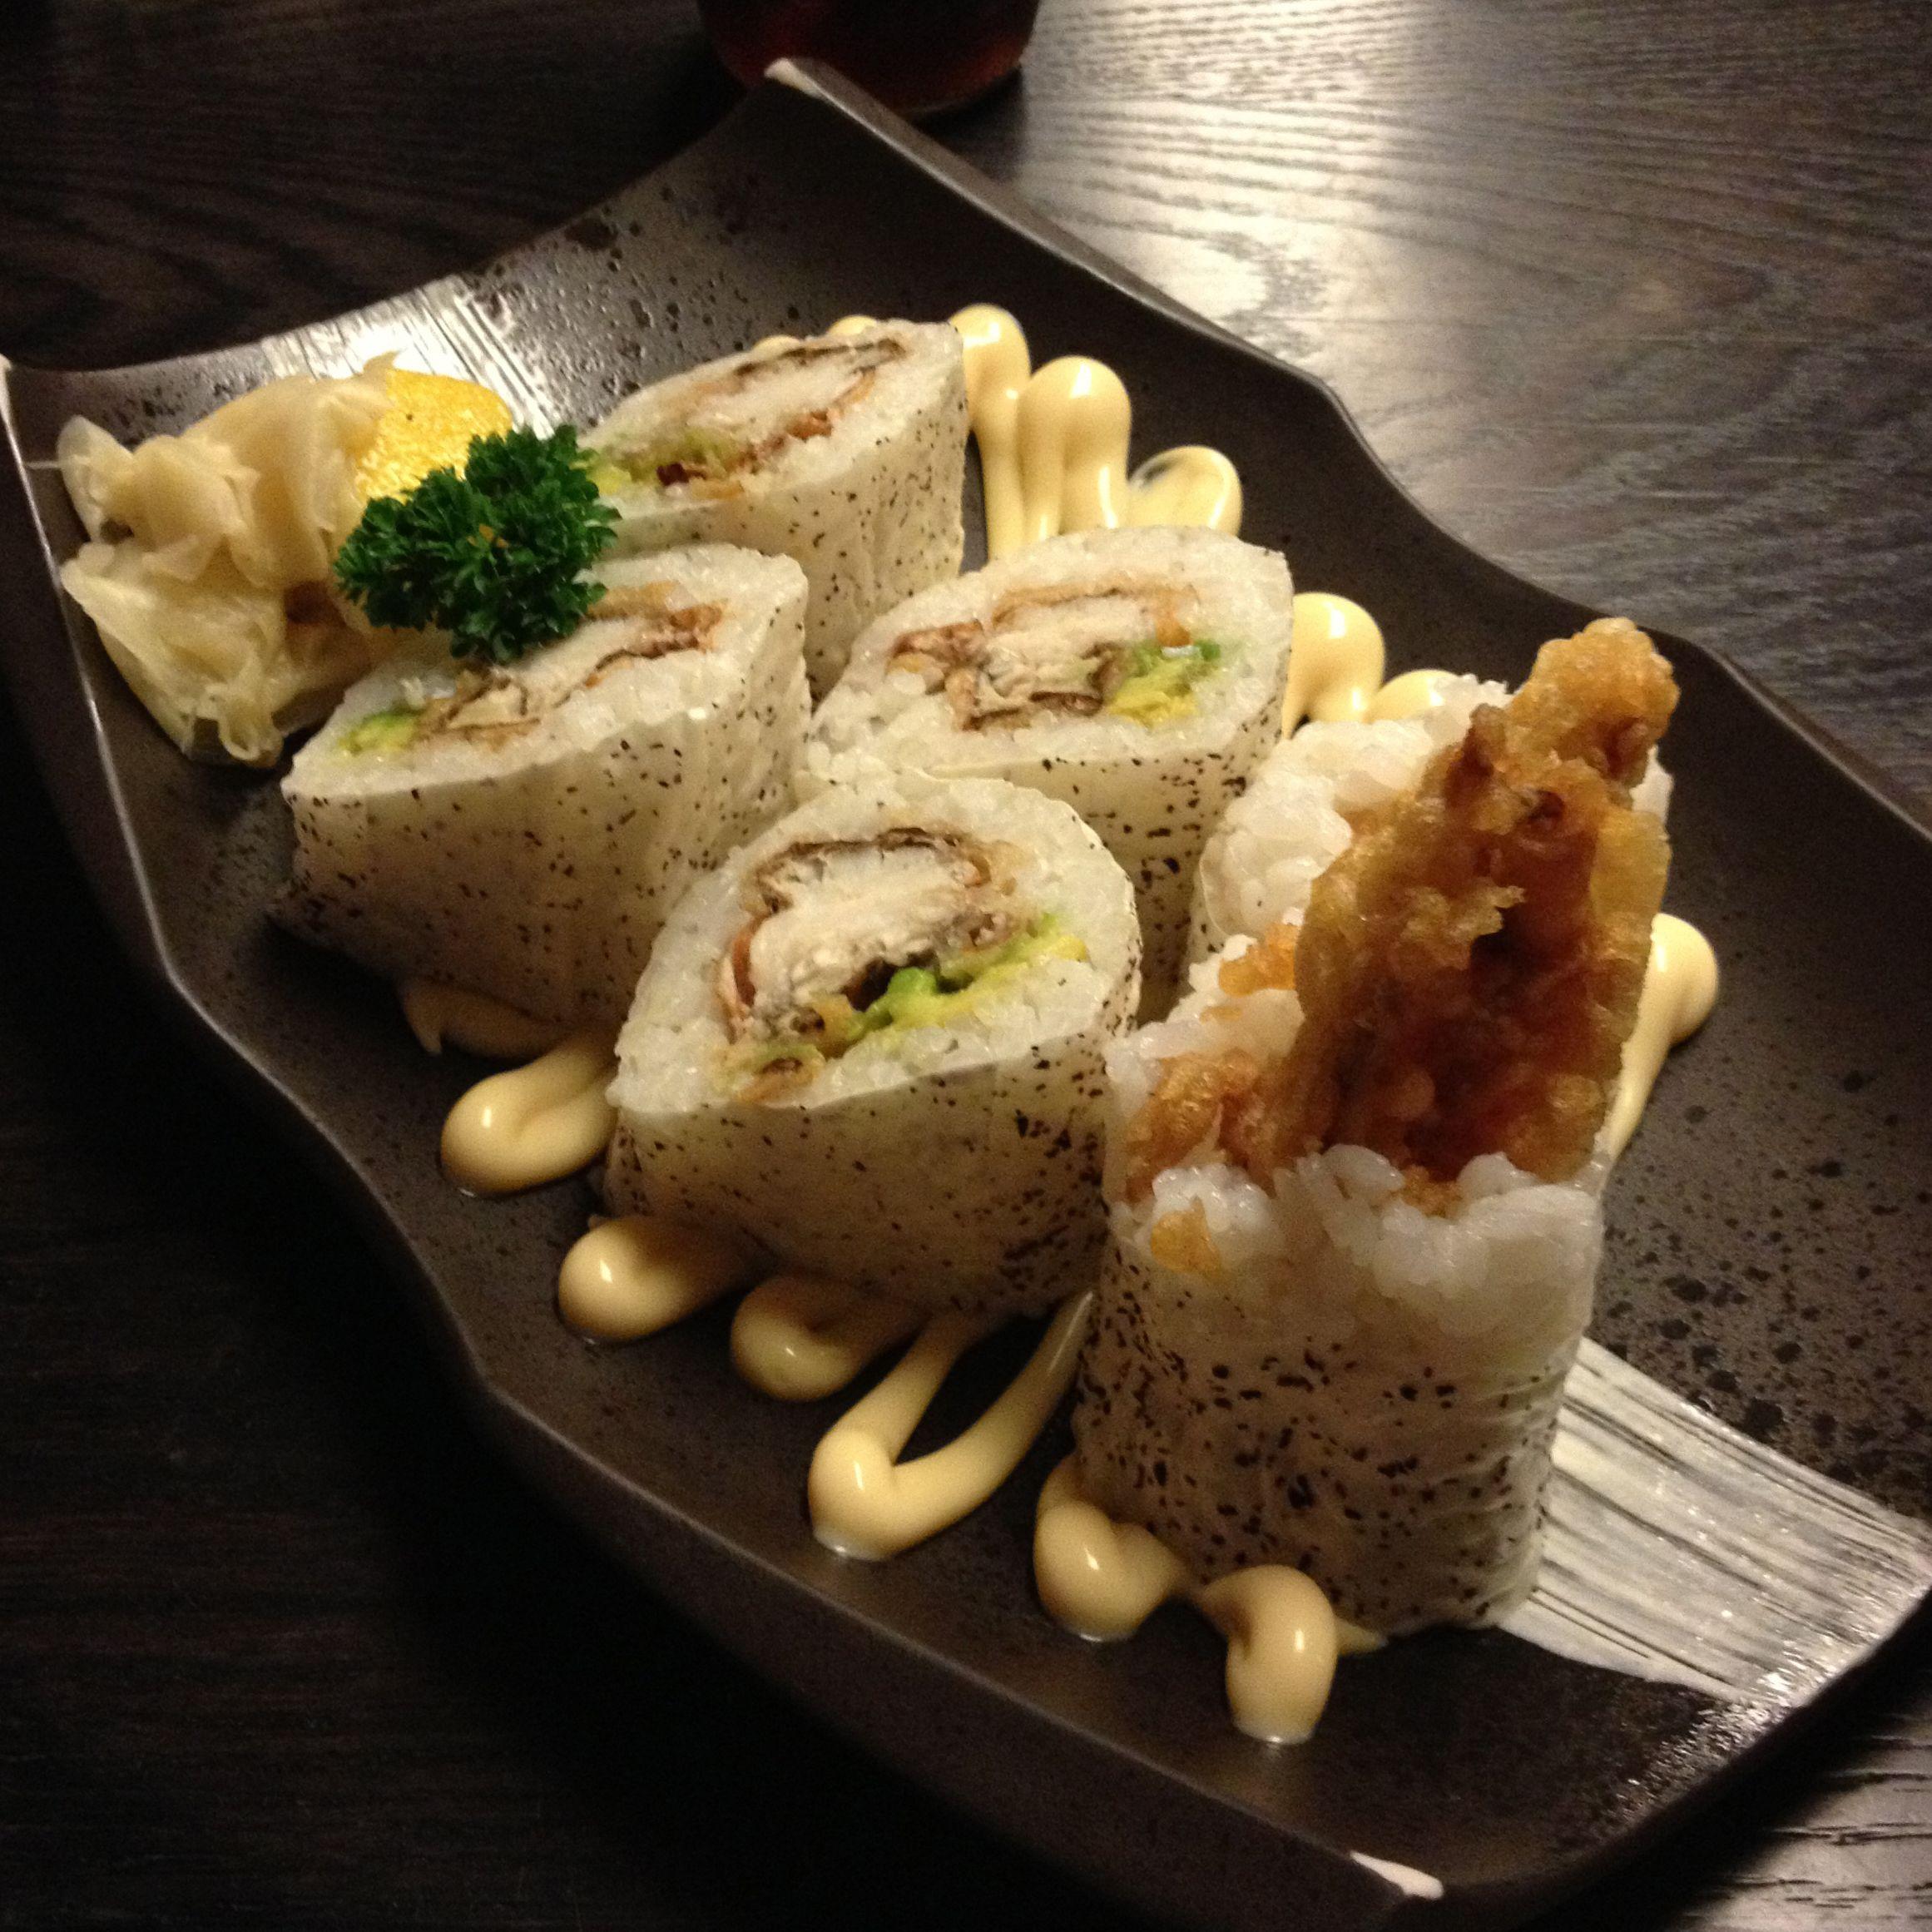 Chiba (Moonee Ponds) Soft Shell Crab Sushi